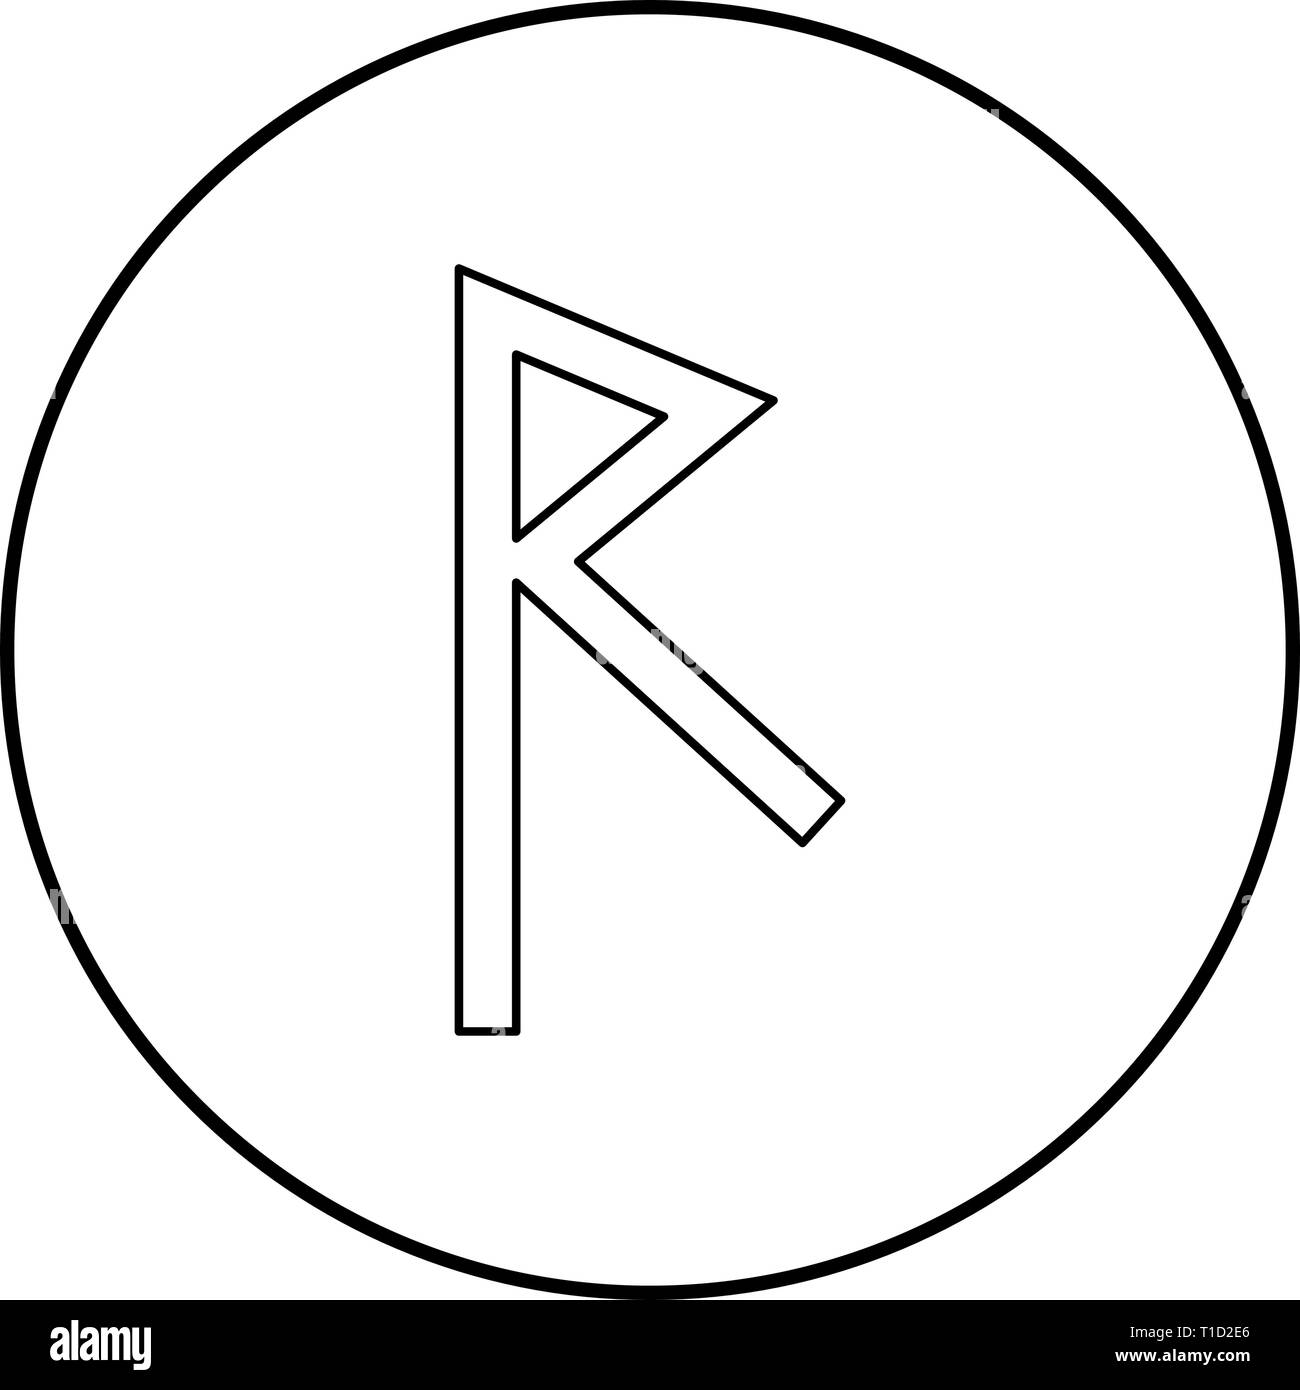 Raido rune raid symbol road icon outline black color vector in circle round illustration flat style simple image - Stock Vector